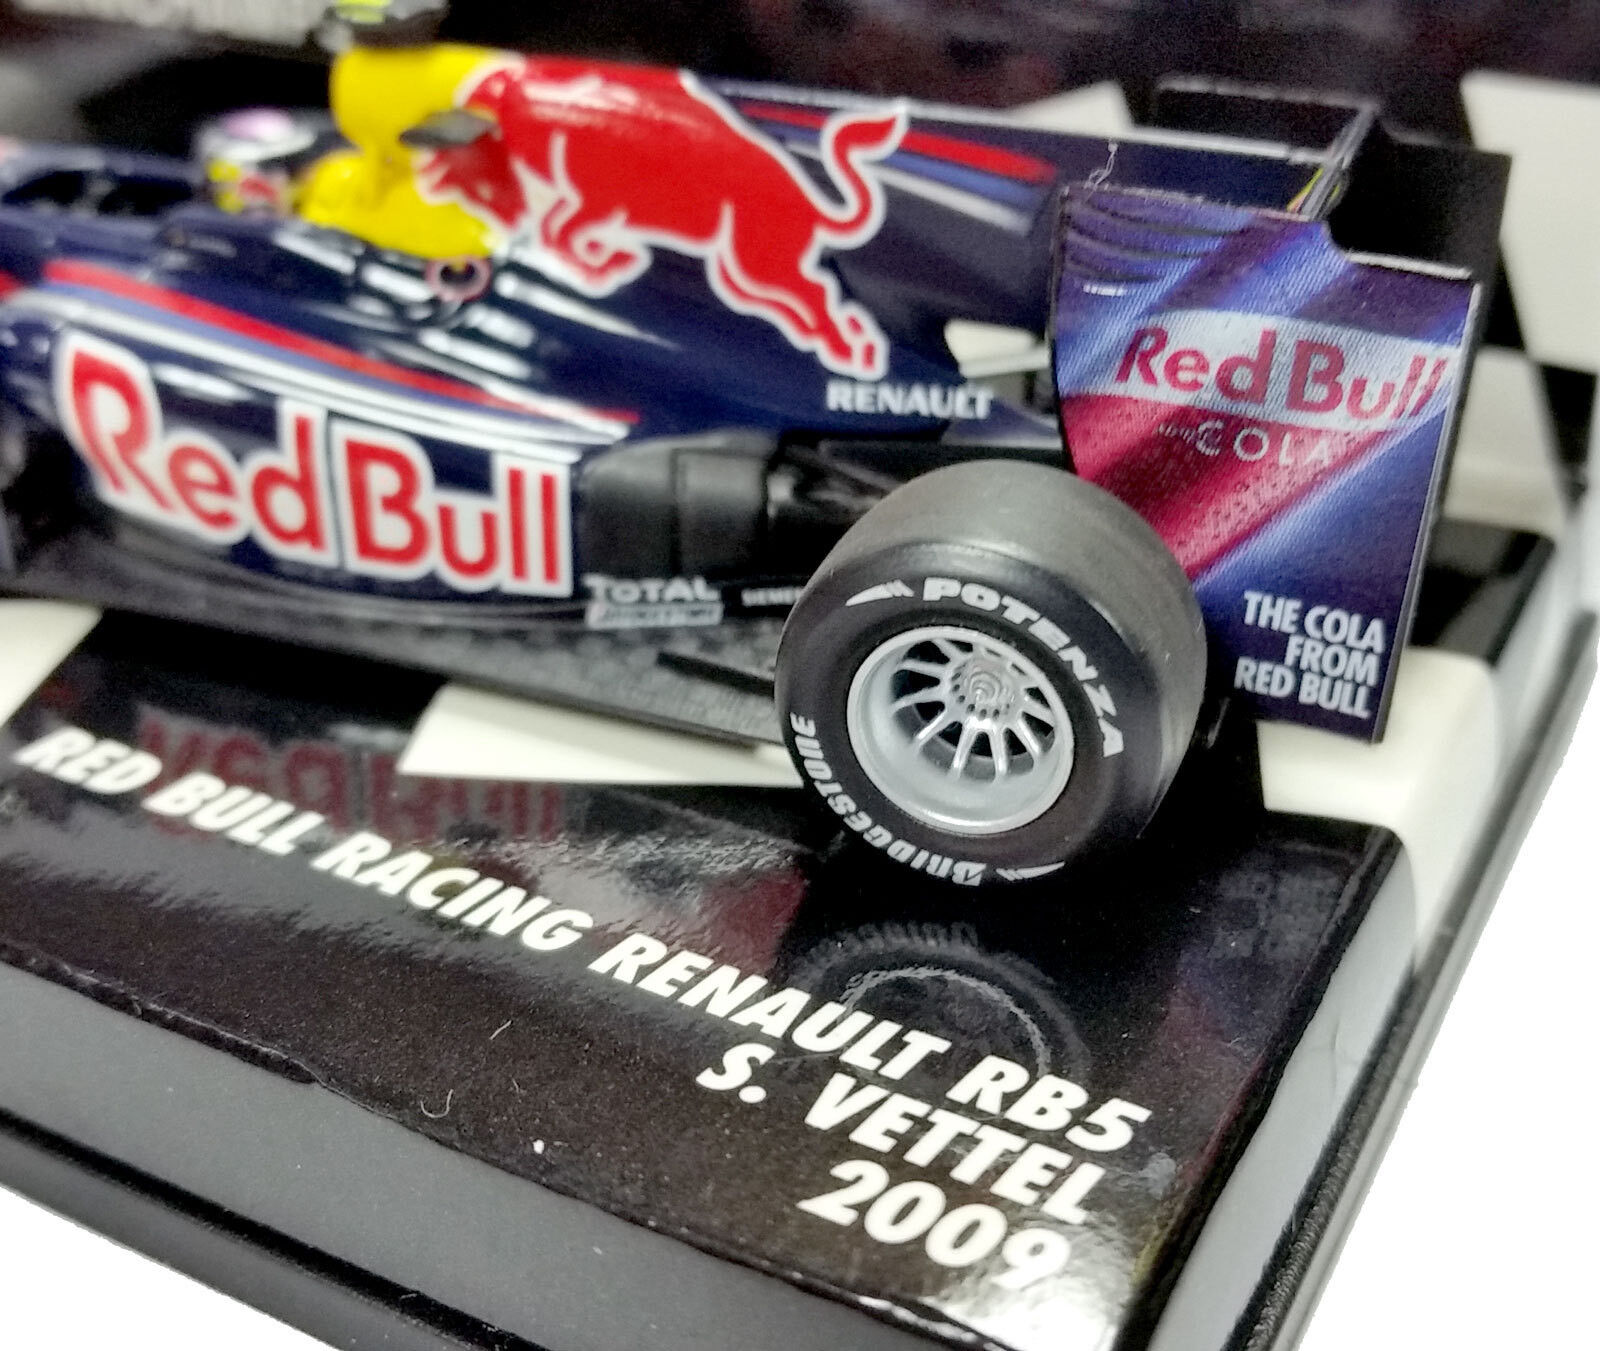 envío gratis Minichamps 1 43 43 43 2009 rojo Bull F1 Racing Renault Rb5 Sebastien Vettel 400090015  deportes calientes